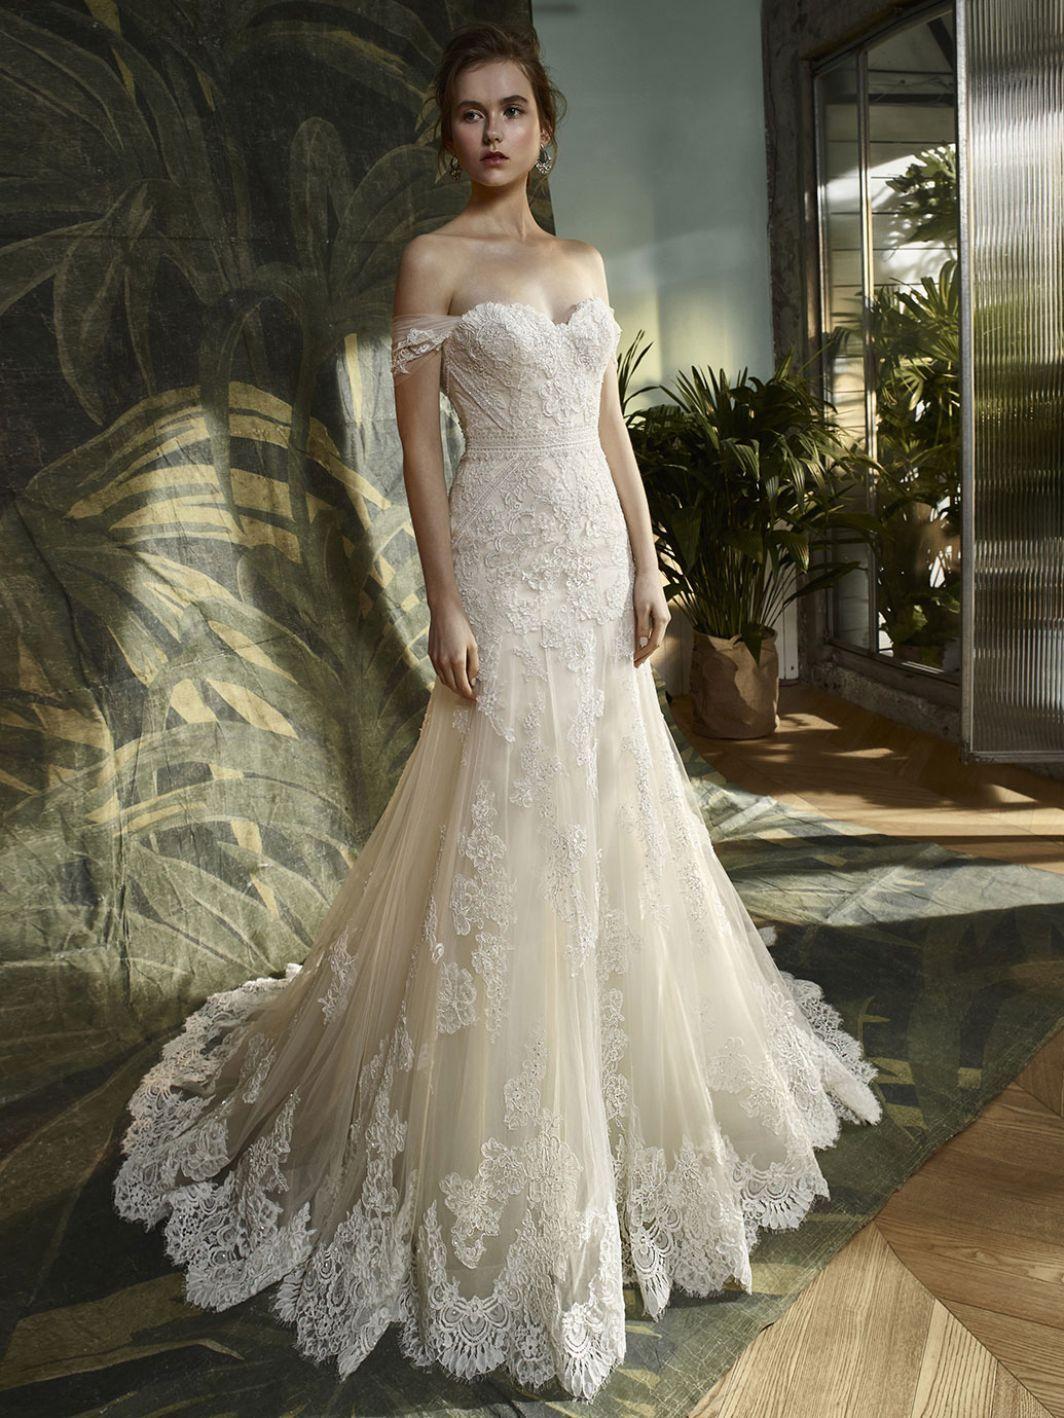 291e86985fd7 Kara - Enzoani Blue Collection | Enzoani Bridal in 2019 | Wedding ...